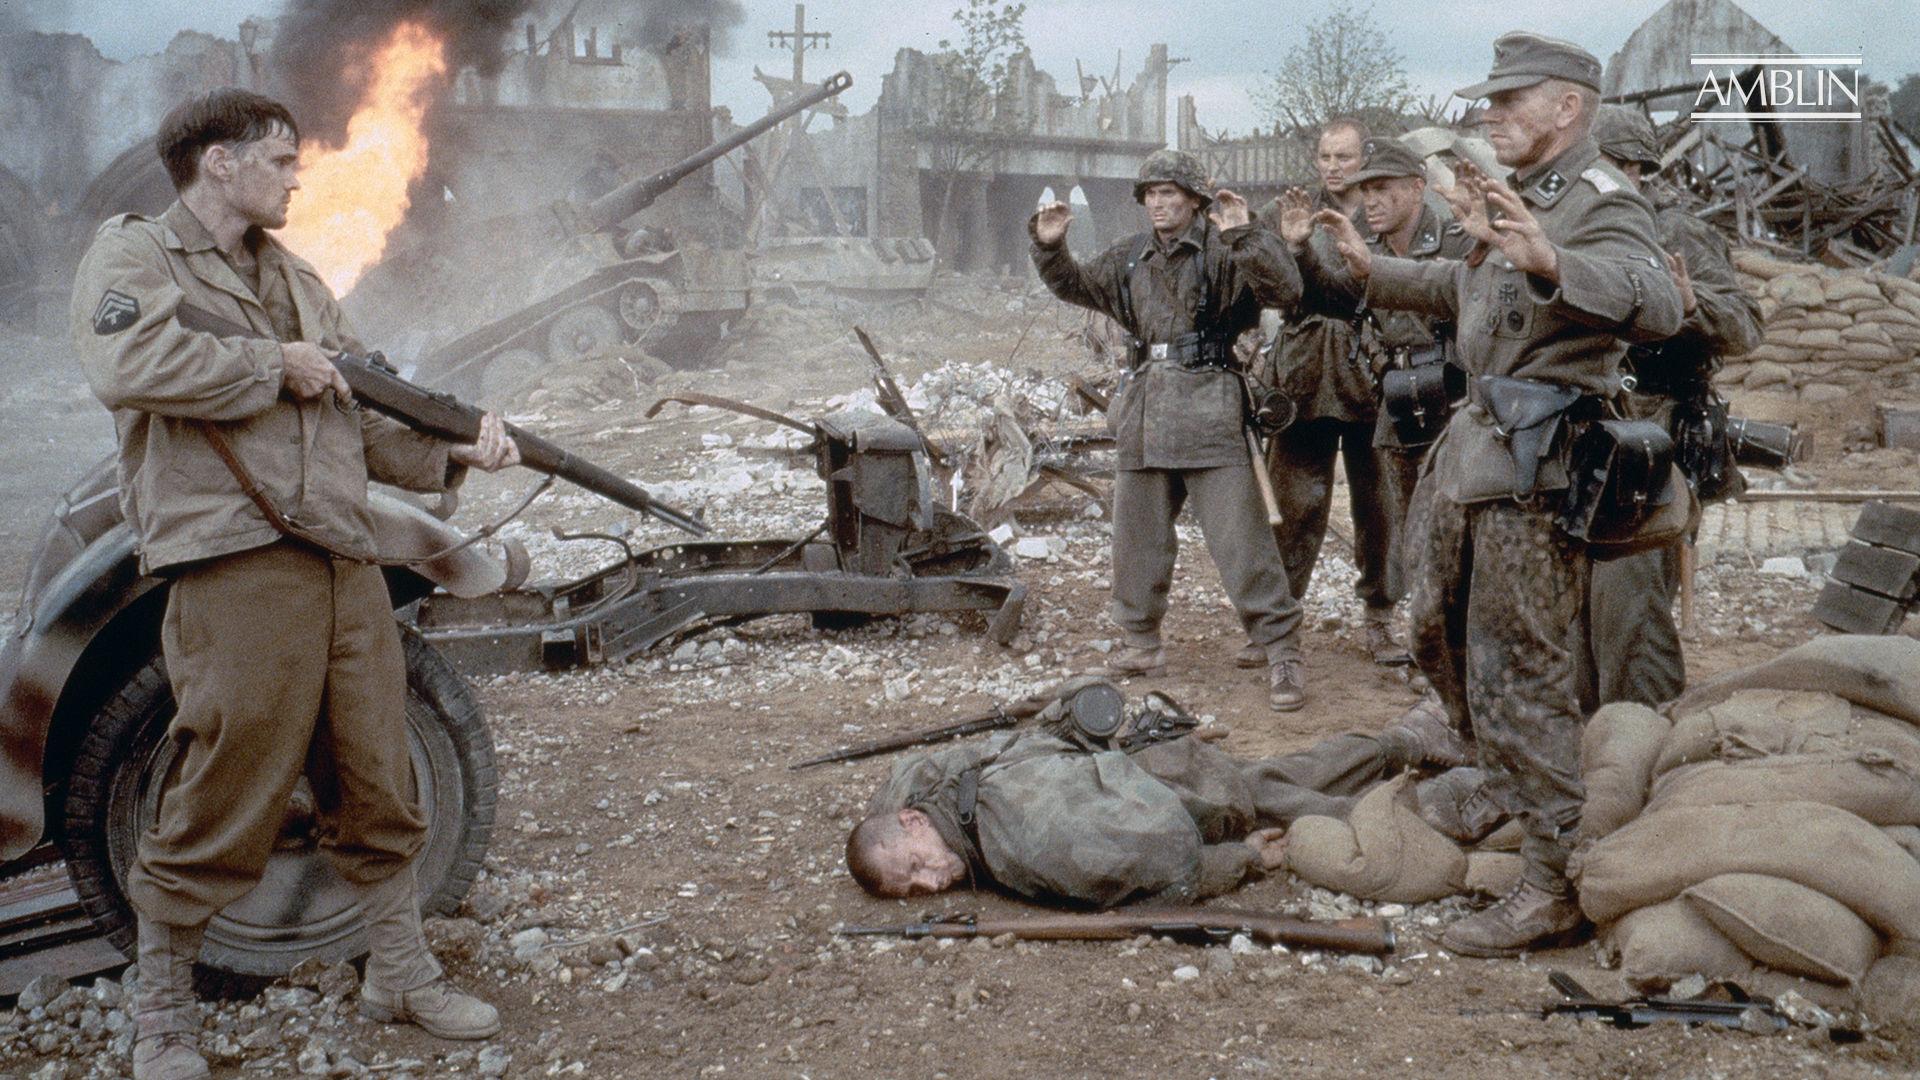 Saving Private Ryan 1998 Steven Spielberg Director Amblin